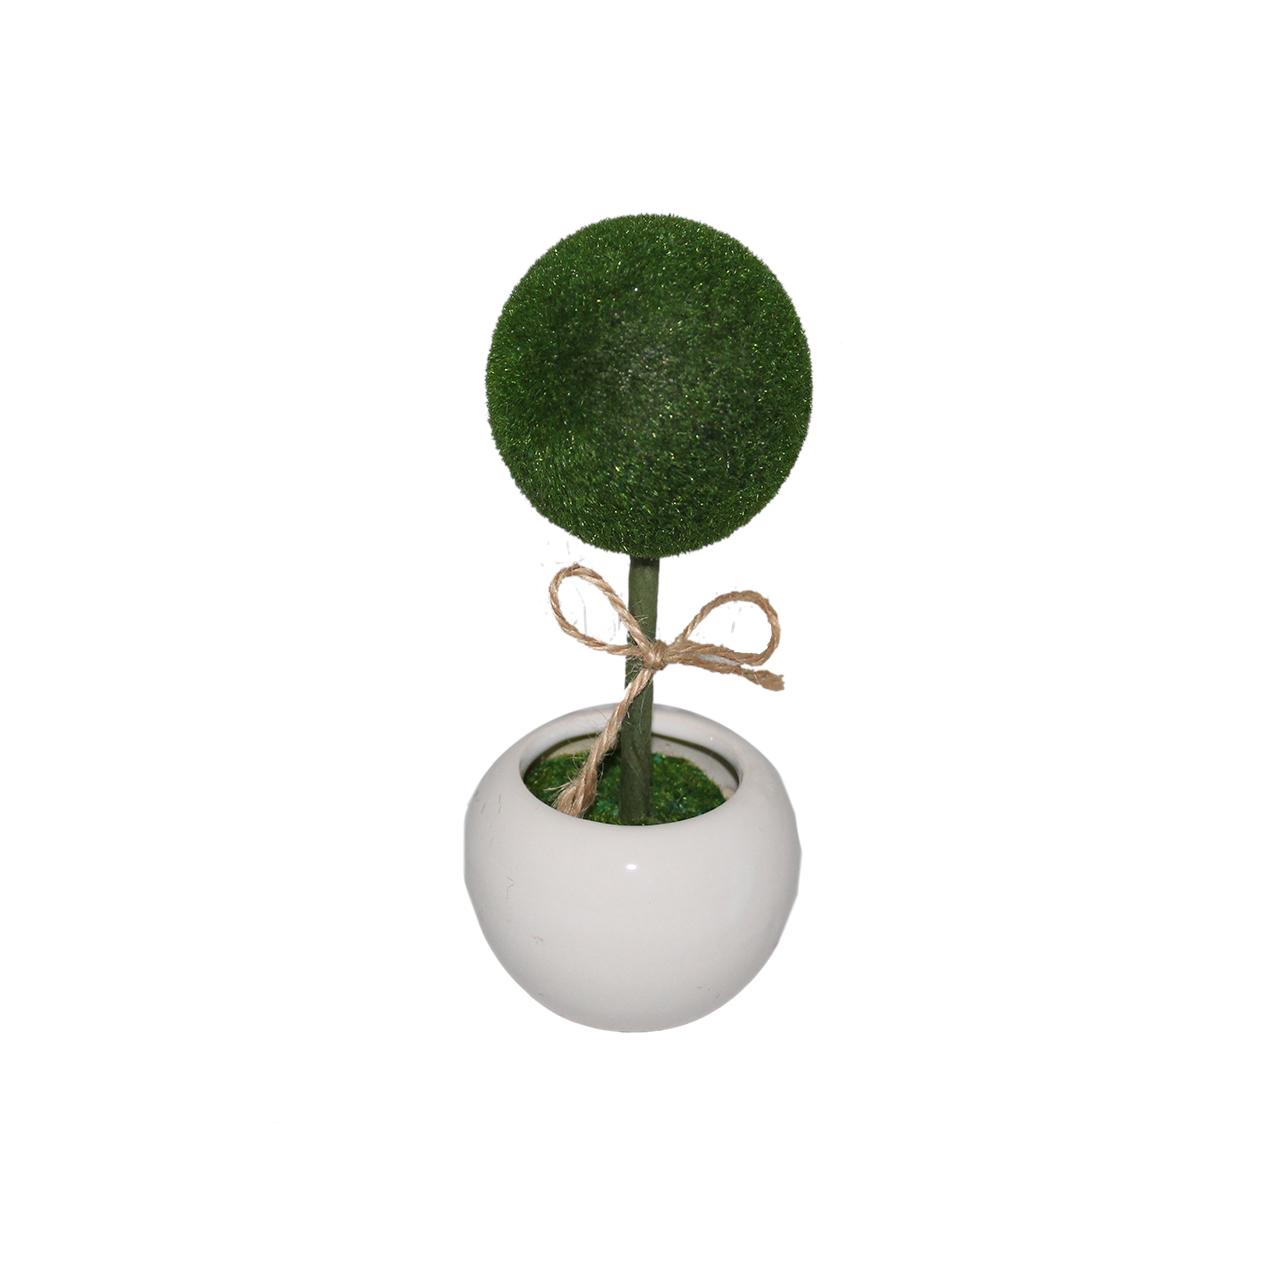 گلدان به همراه گل مصنوعی مدل توپی